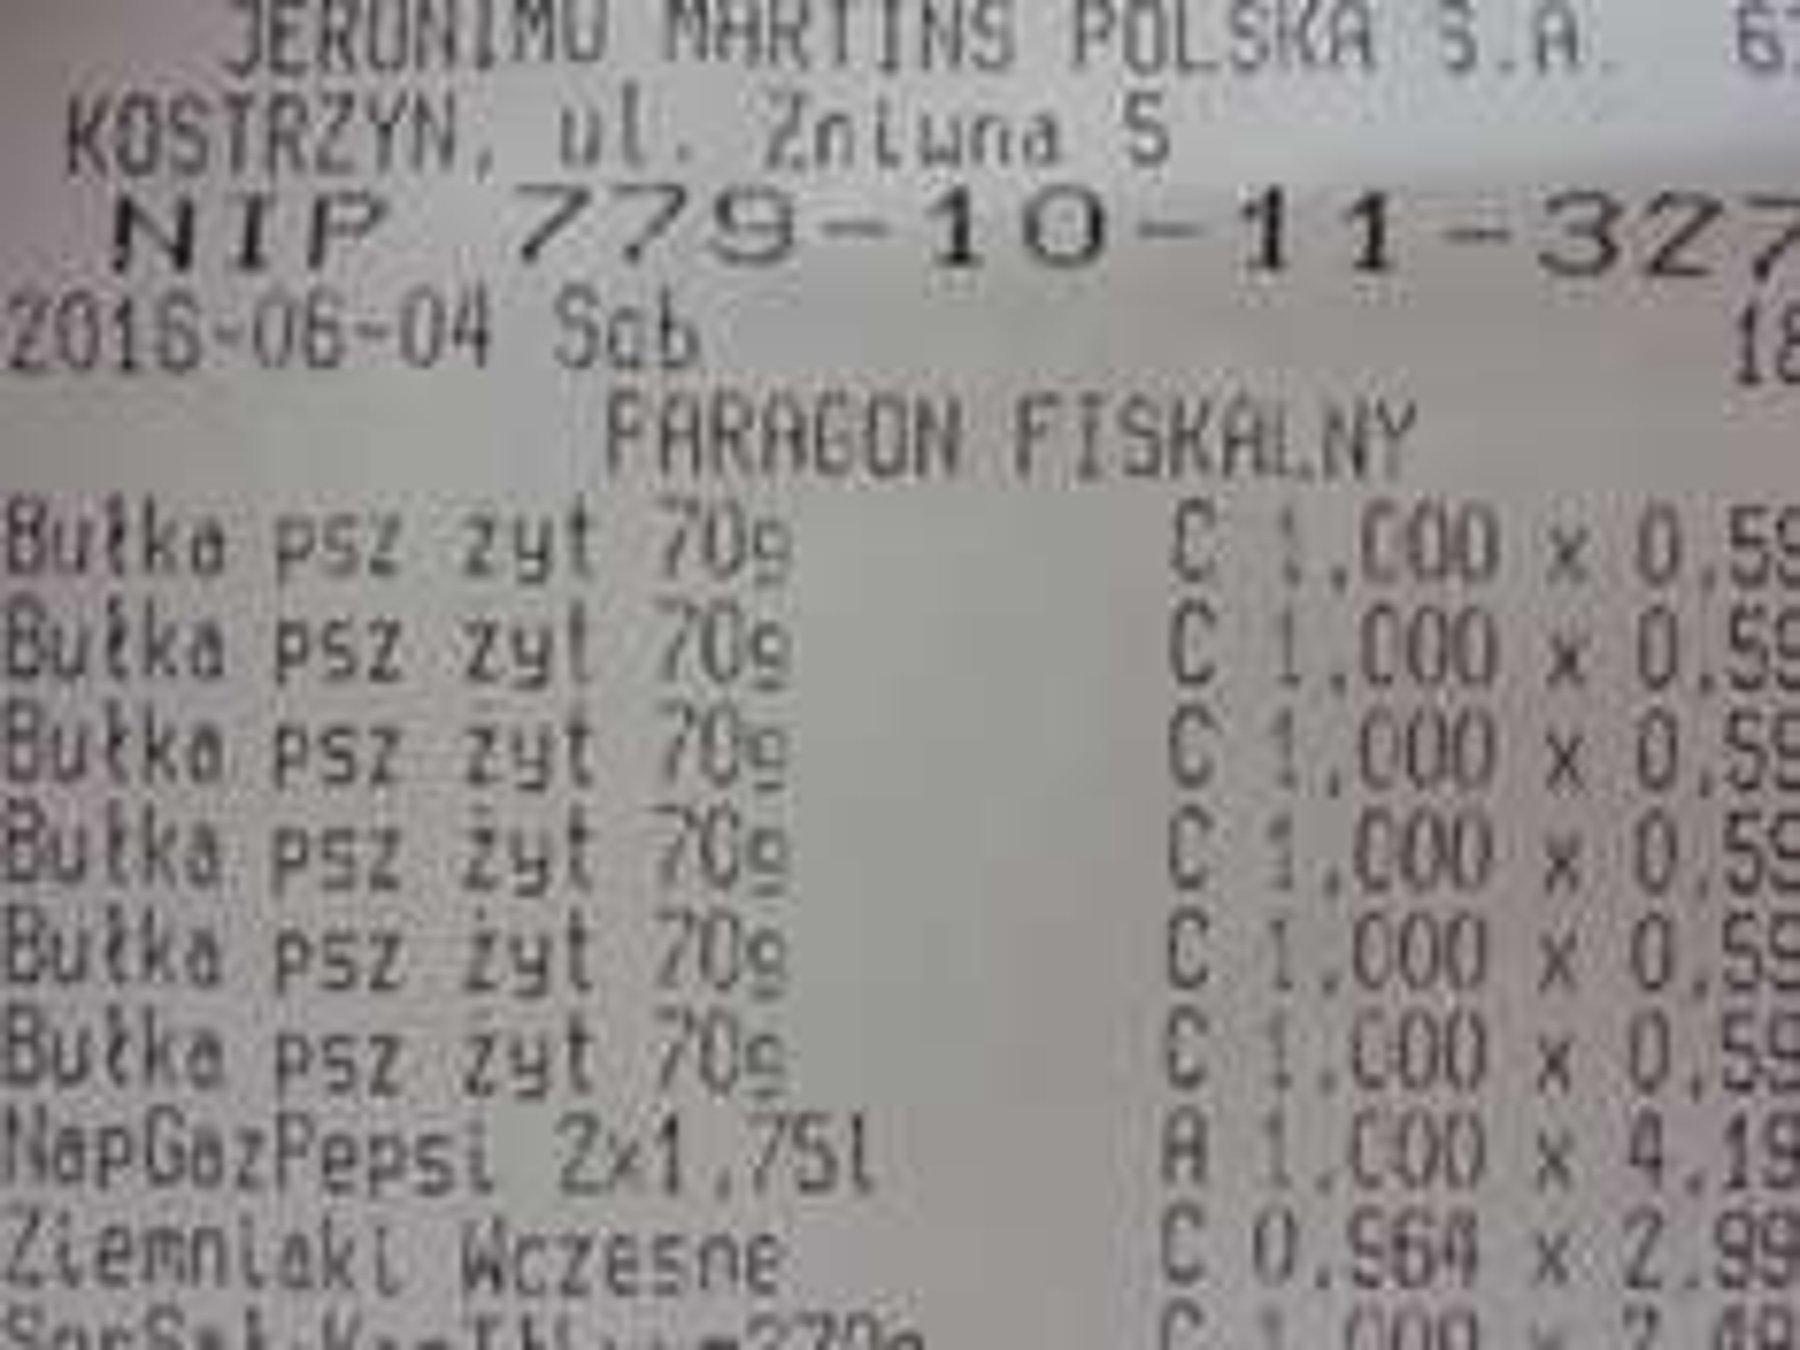 Dwupak pepsi 1,75l za 4,19PLN @Biedronka